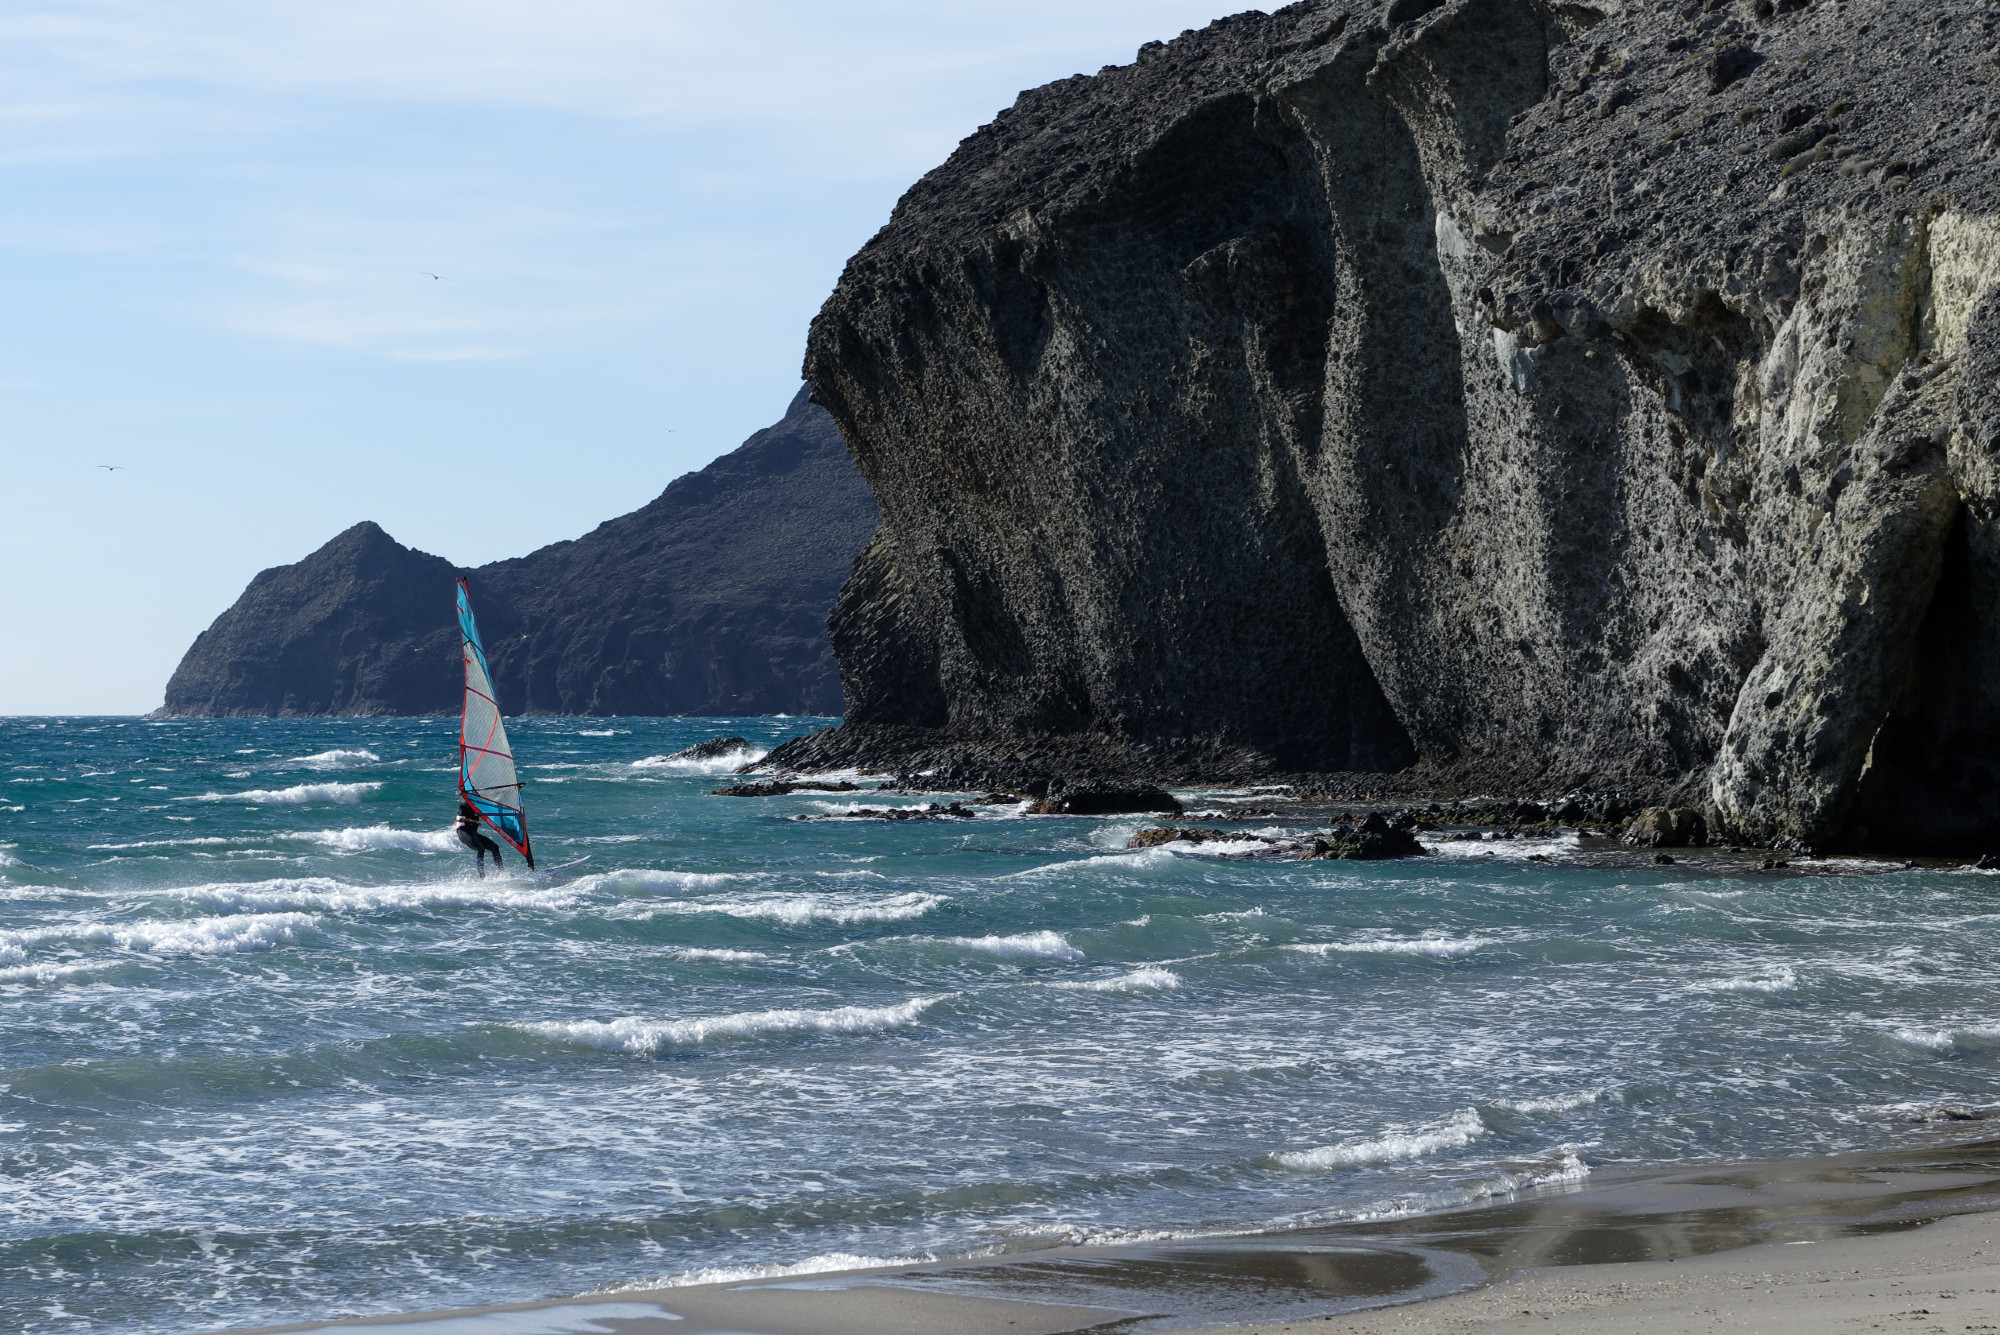 171214-San Jose-Playa del Monsul (Cabo de Gata-Andalousie) (195)_1